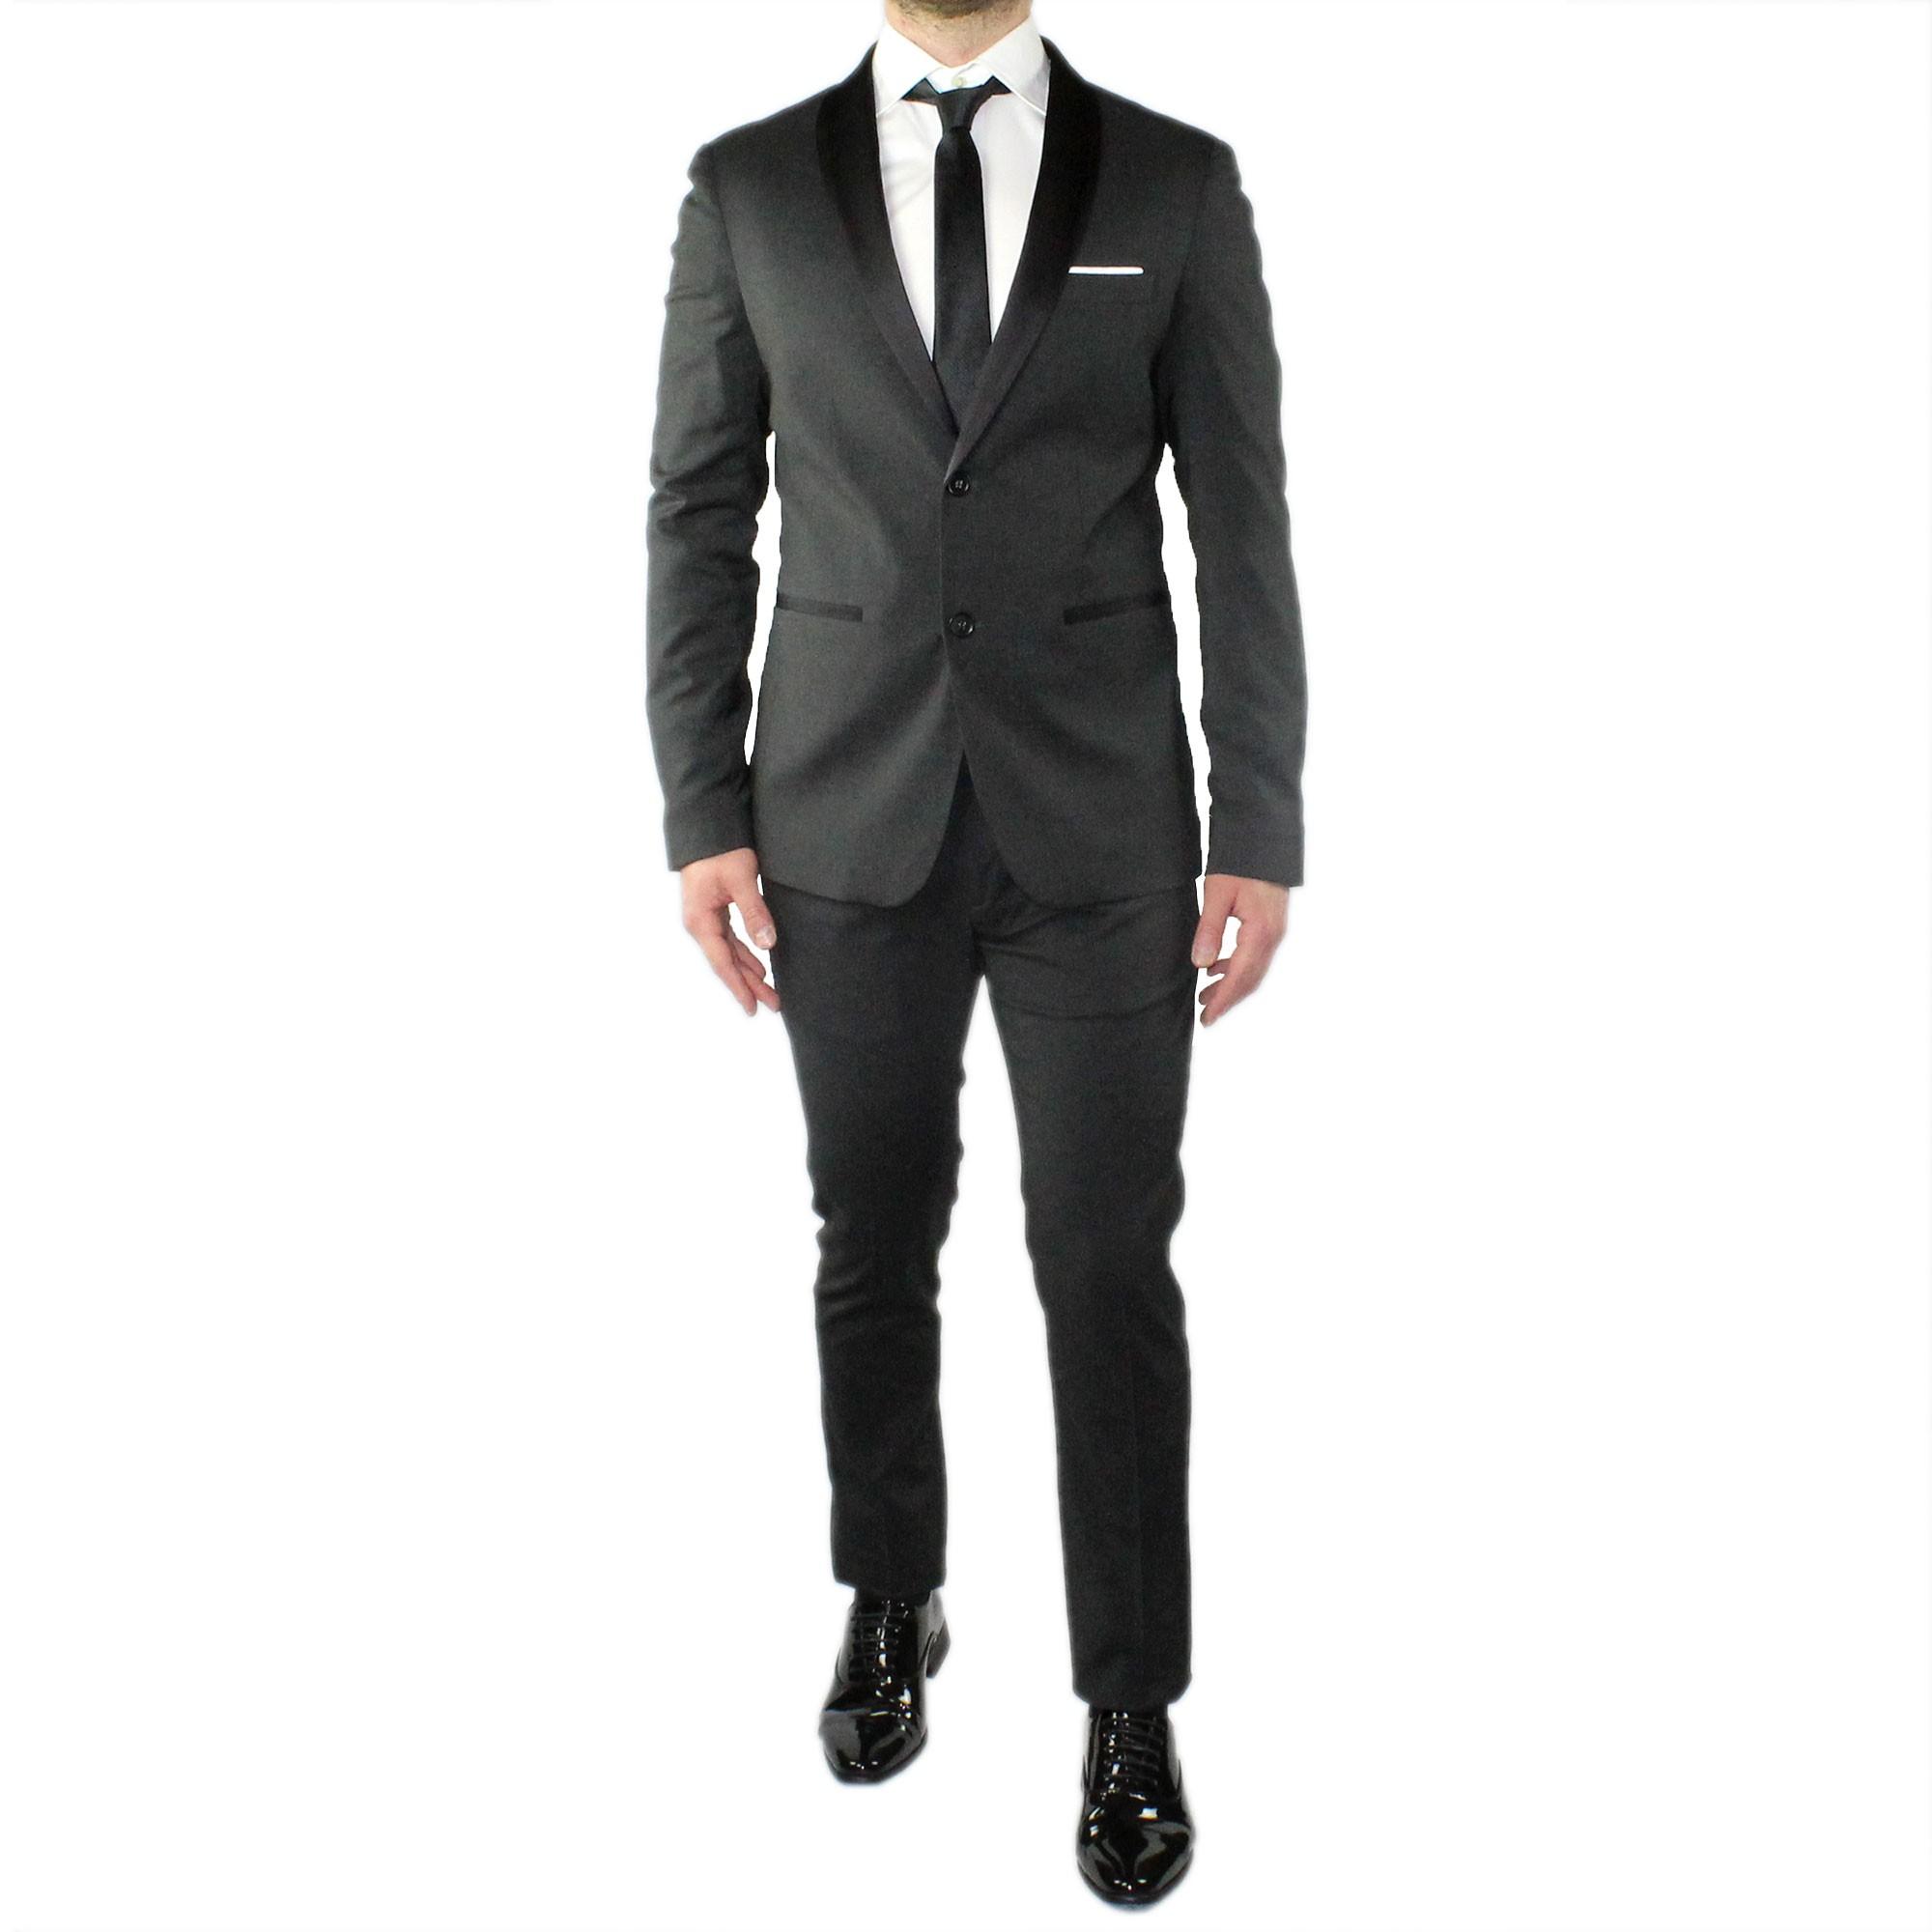 Abito-Uomo-Smoking-Elegante-Vestito-Completo-Estivo-Cerimonia-Sartoriale-Slim miniatura 10